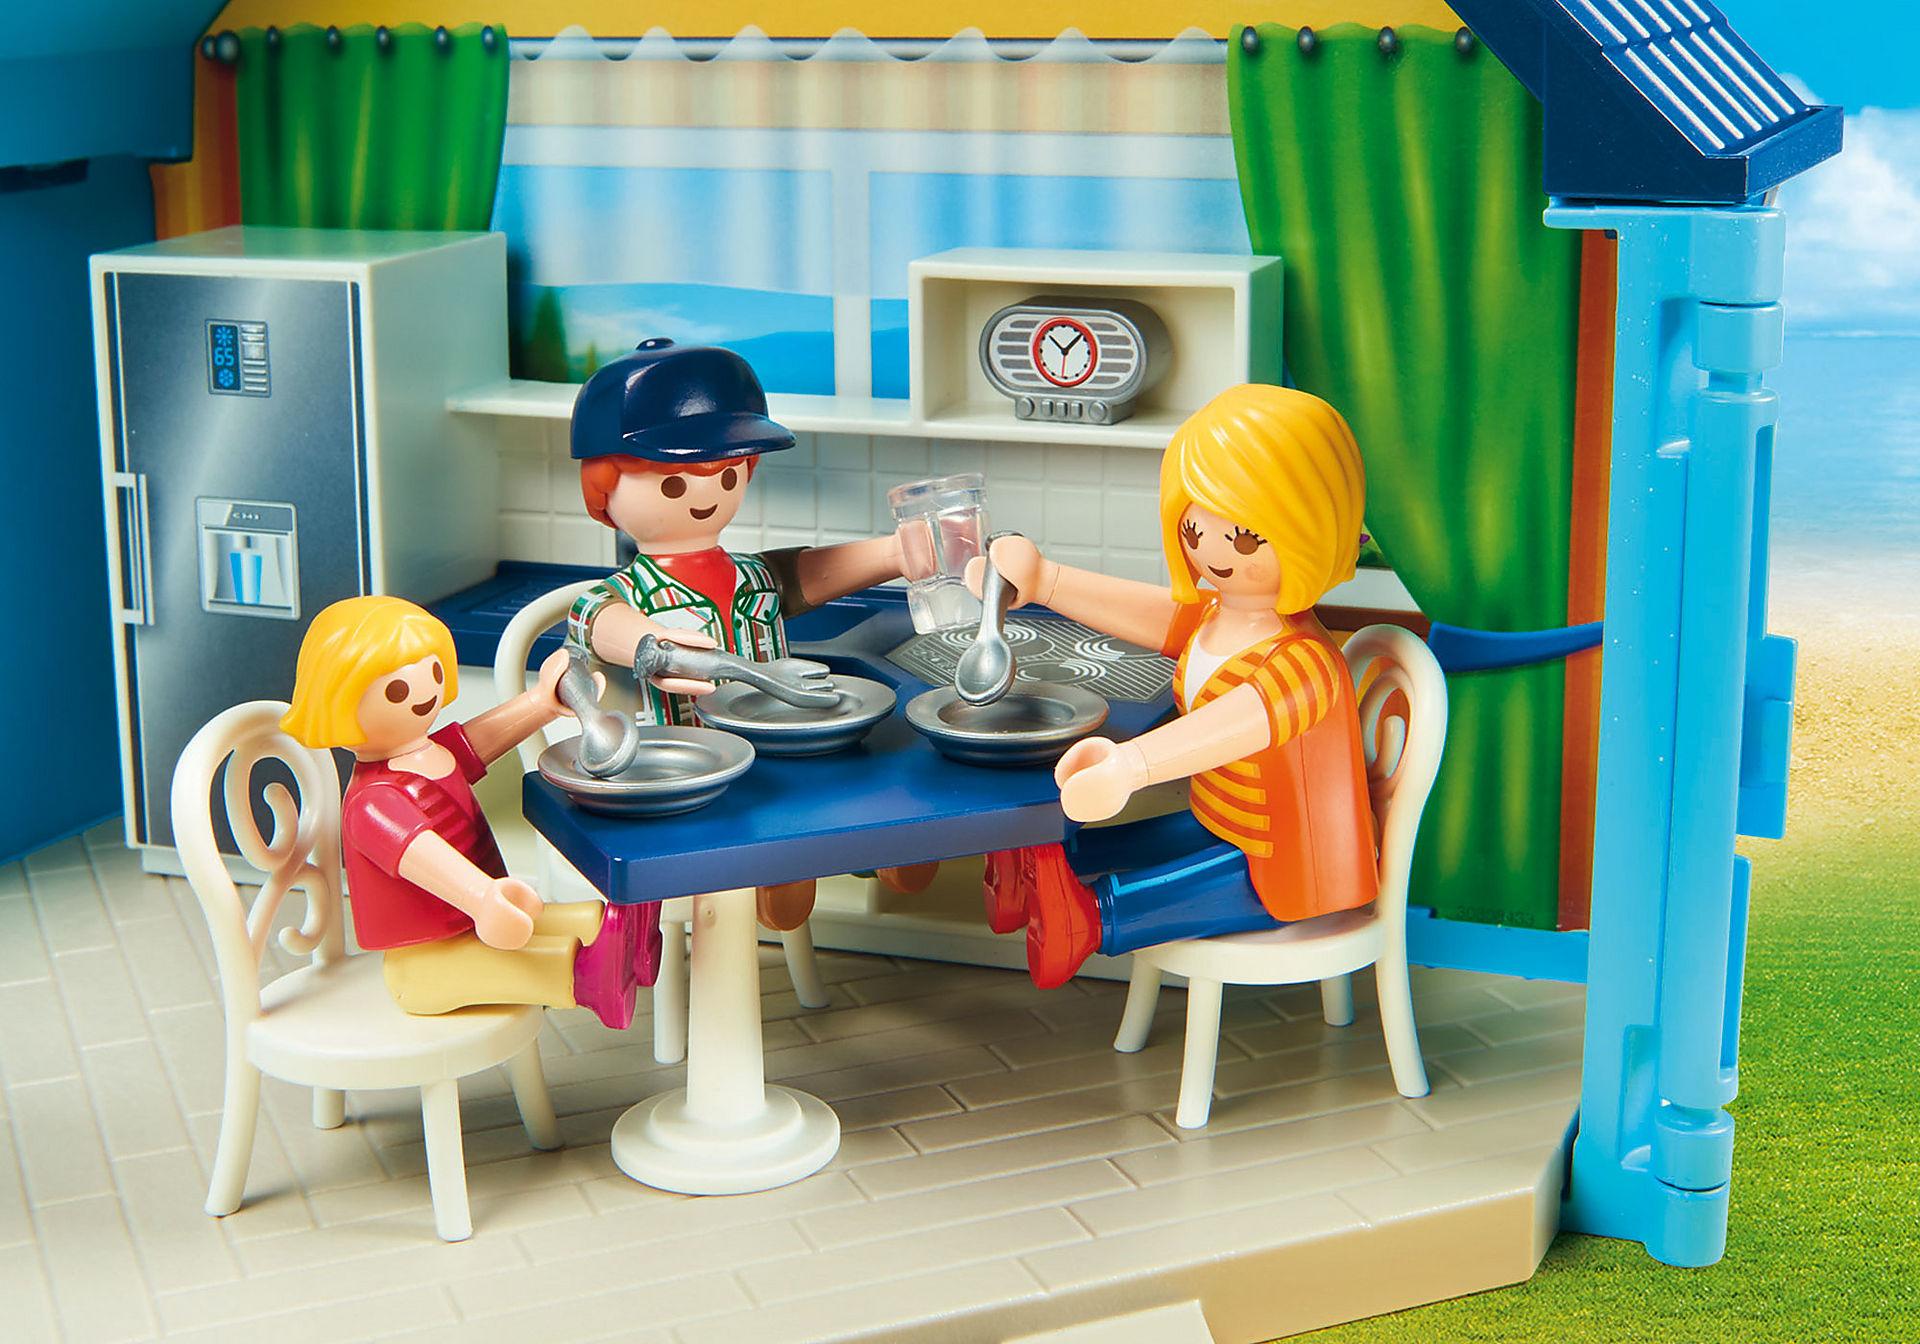 http://media.playmobil.com/i/playmobil/70219_product_extra2/PLAYMOBIL - Funpark Casa de Vacaciones Maletín